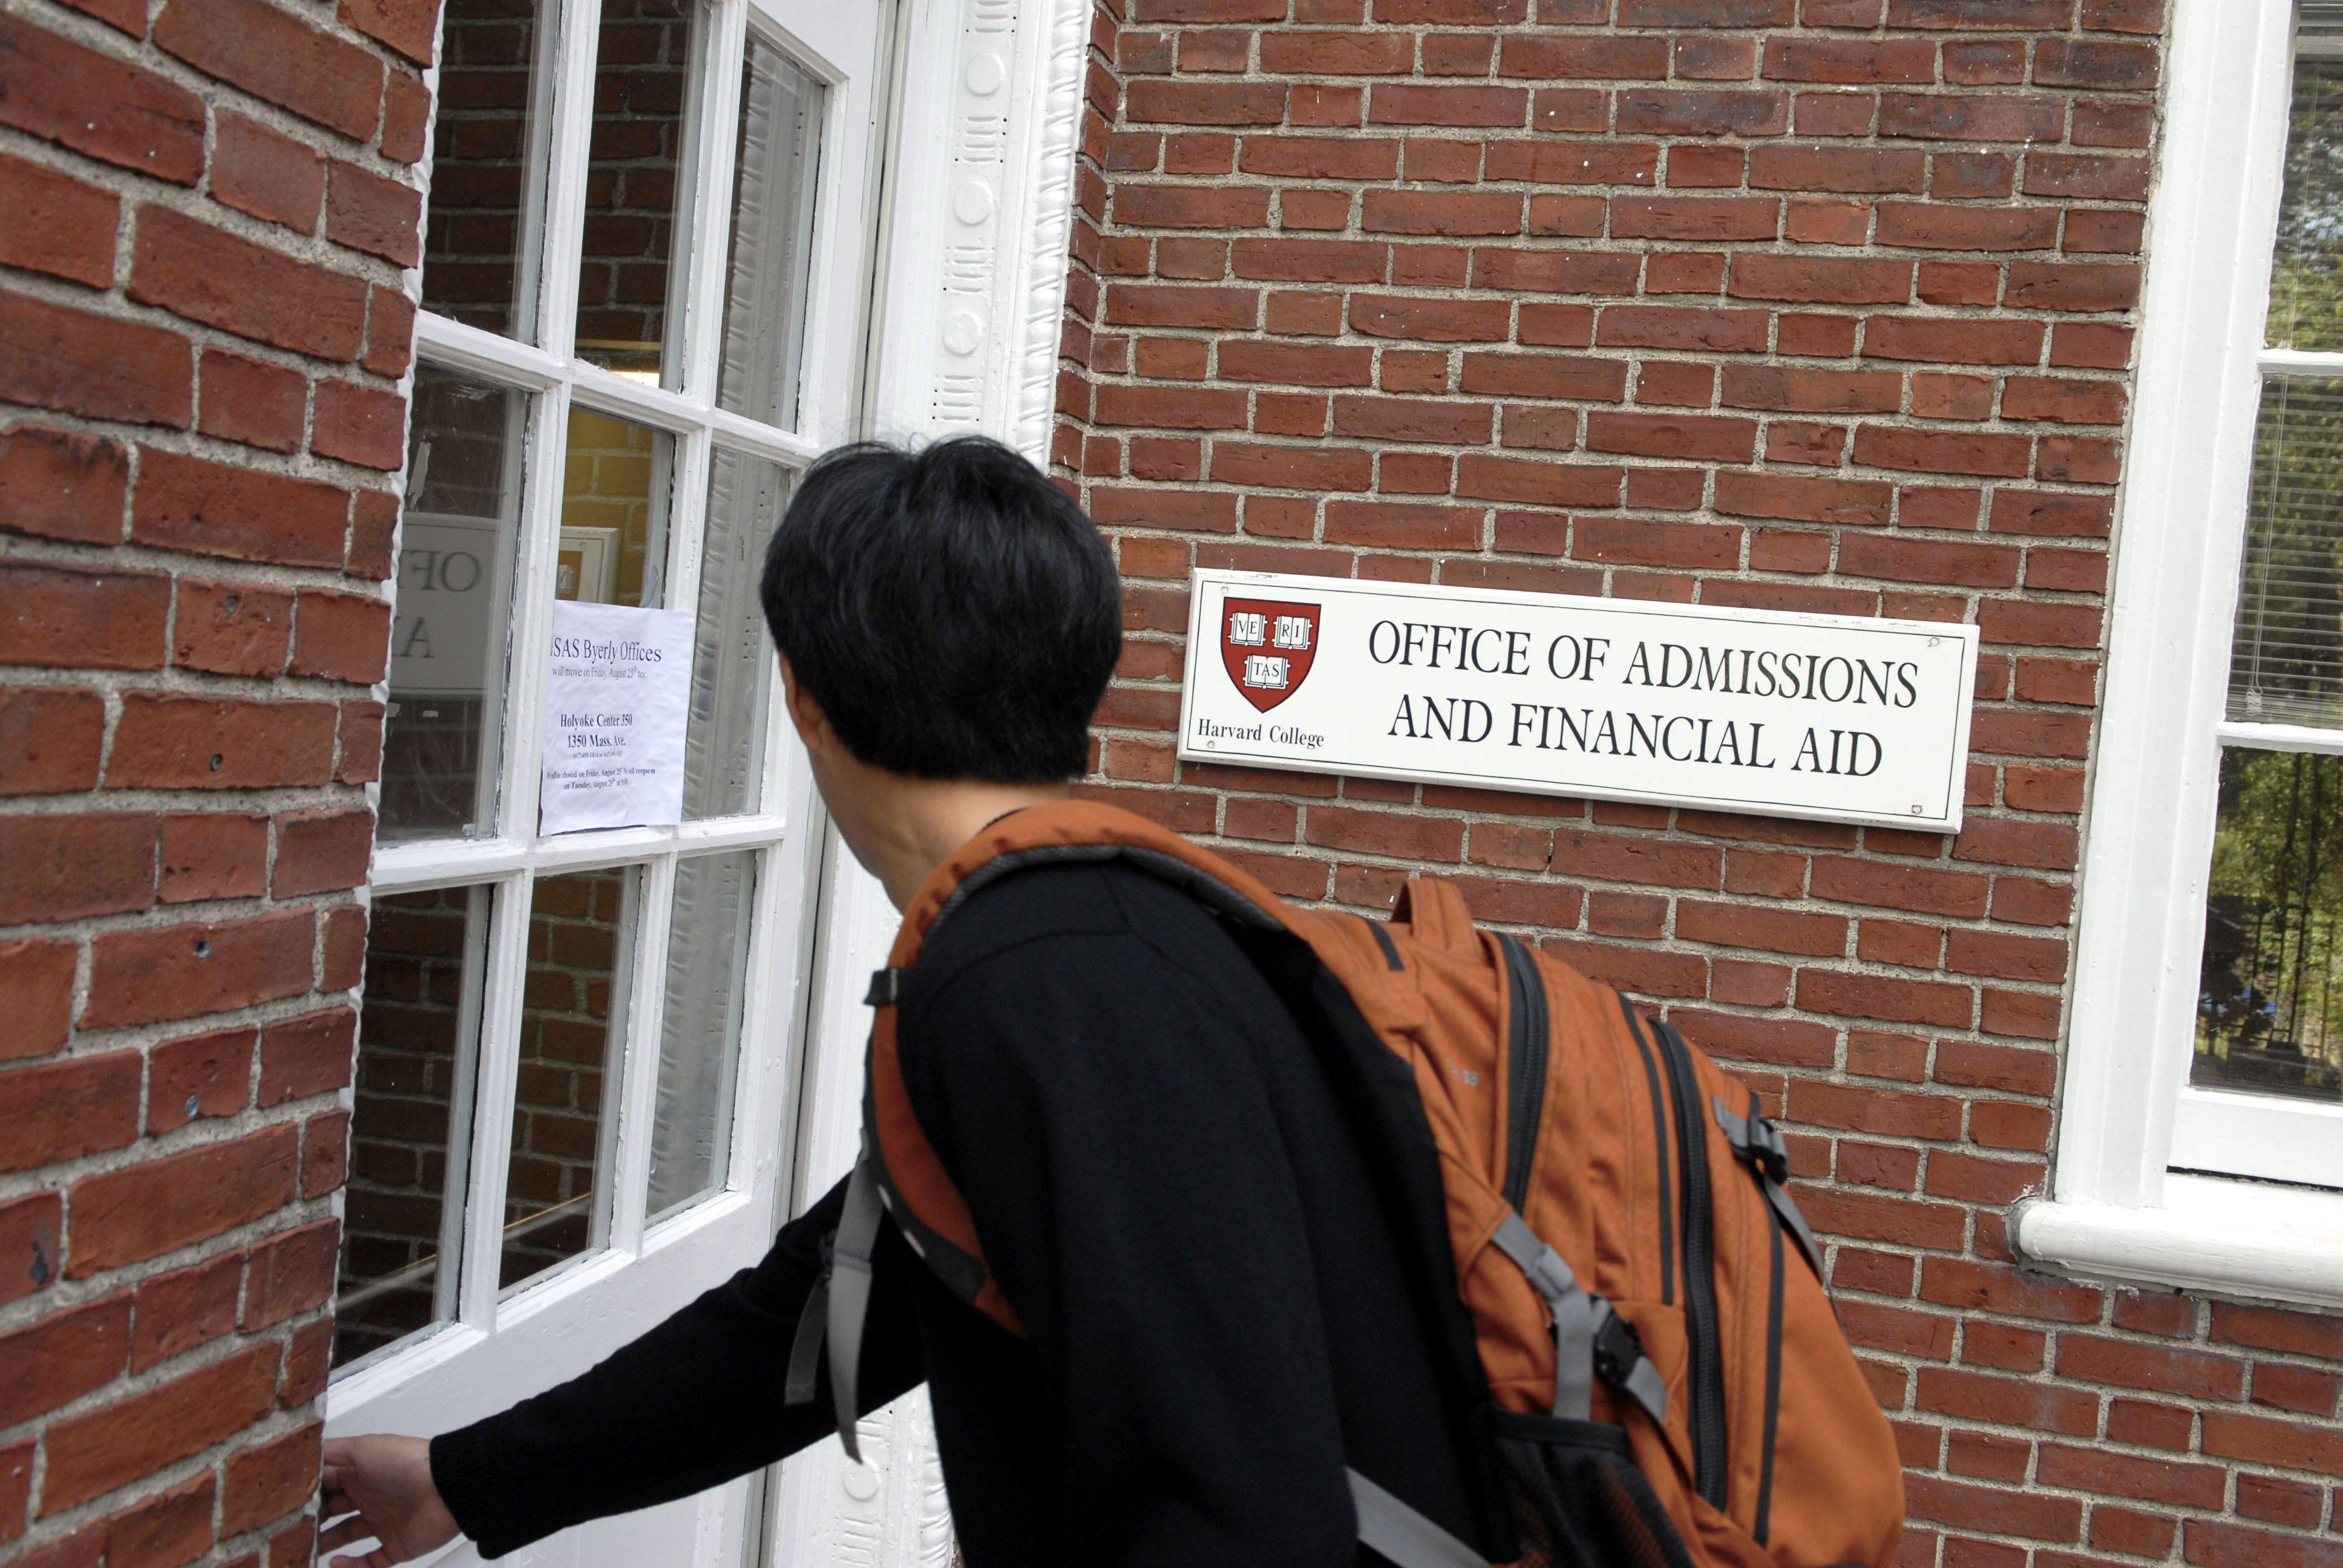 Lawsuit accuses Harvard of discriminating against Asian